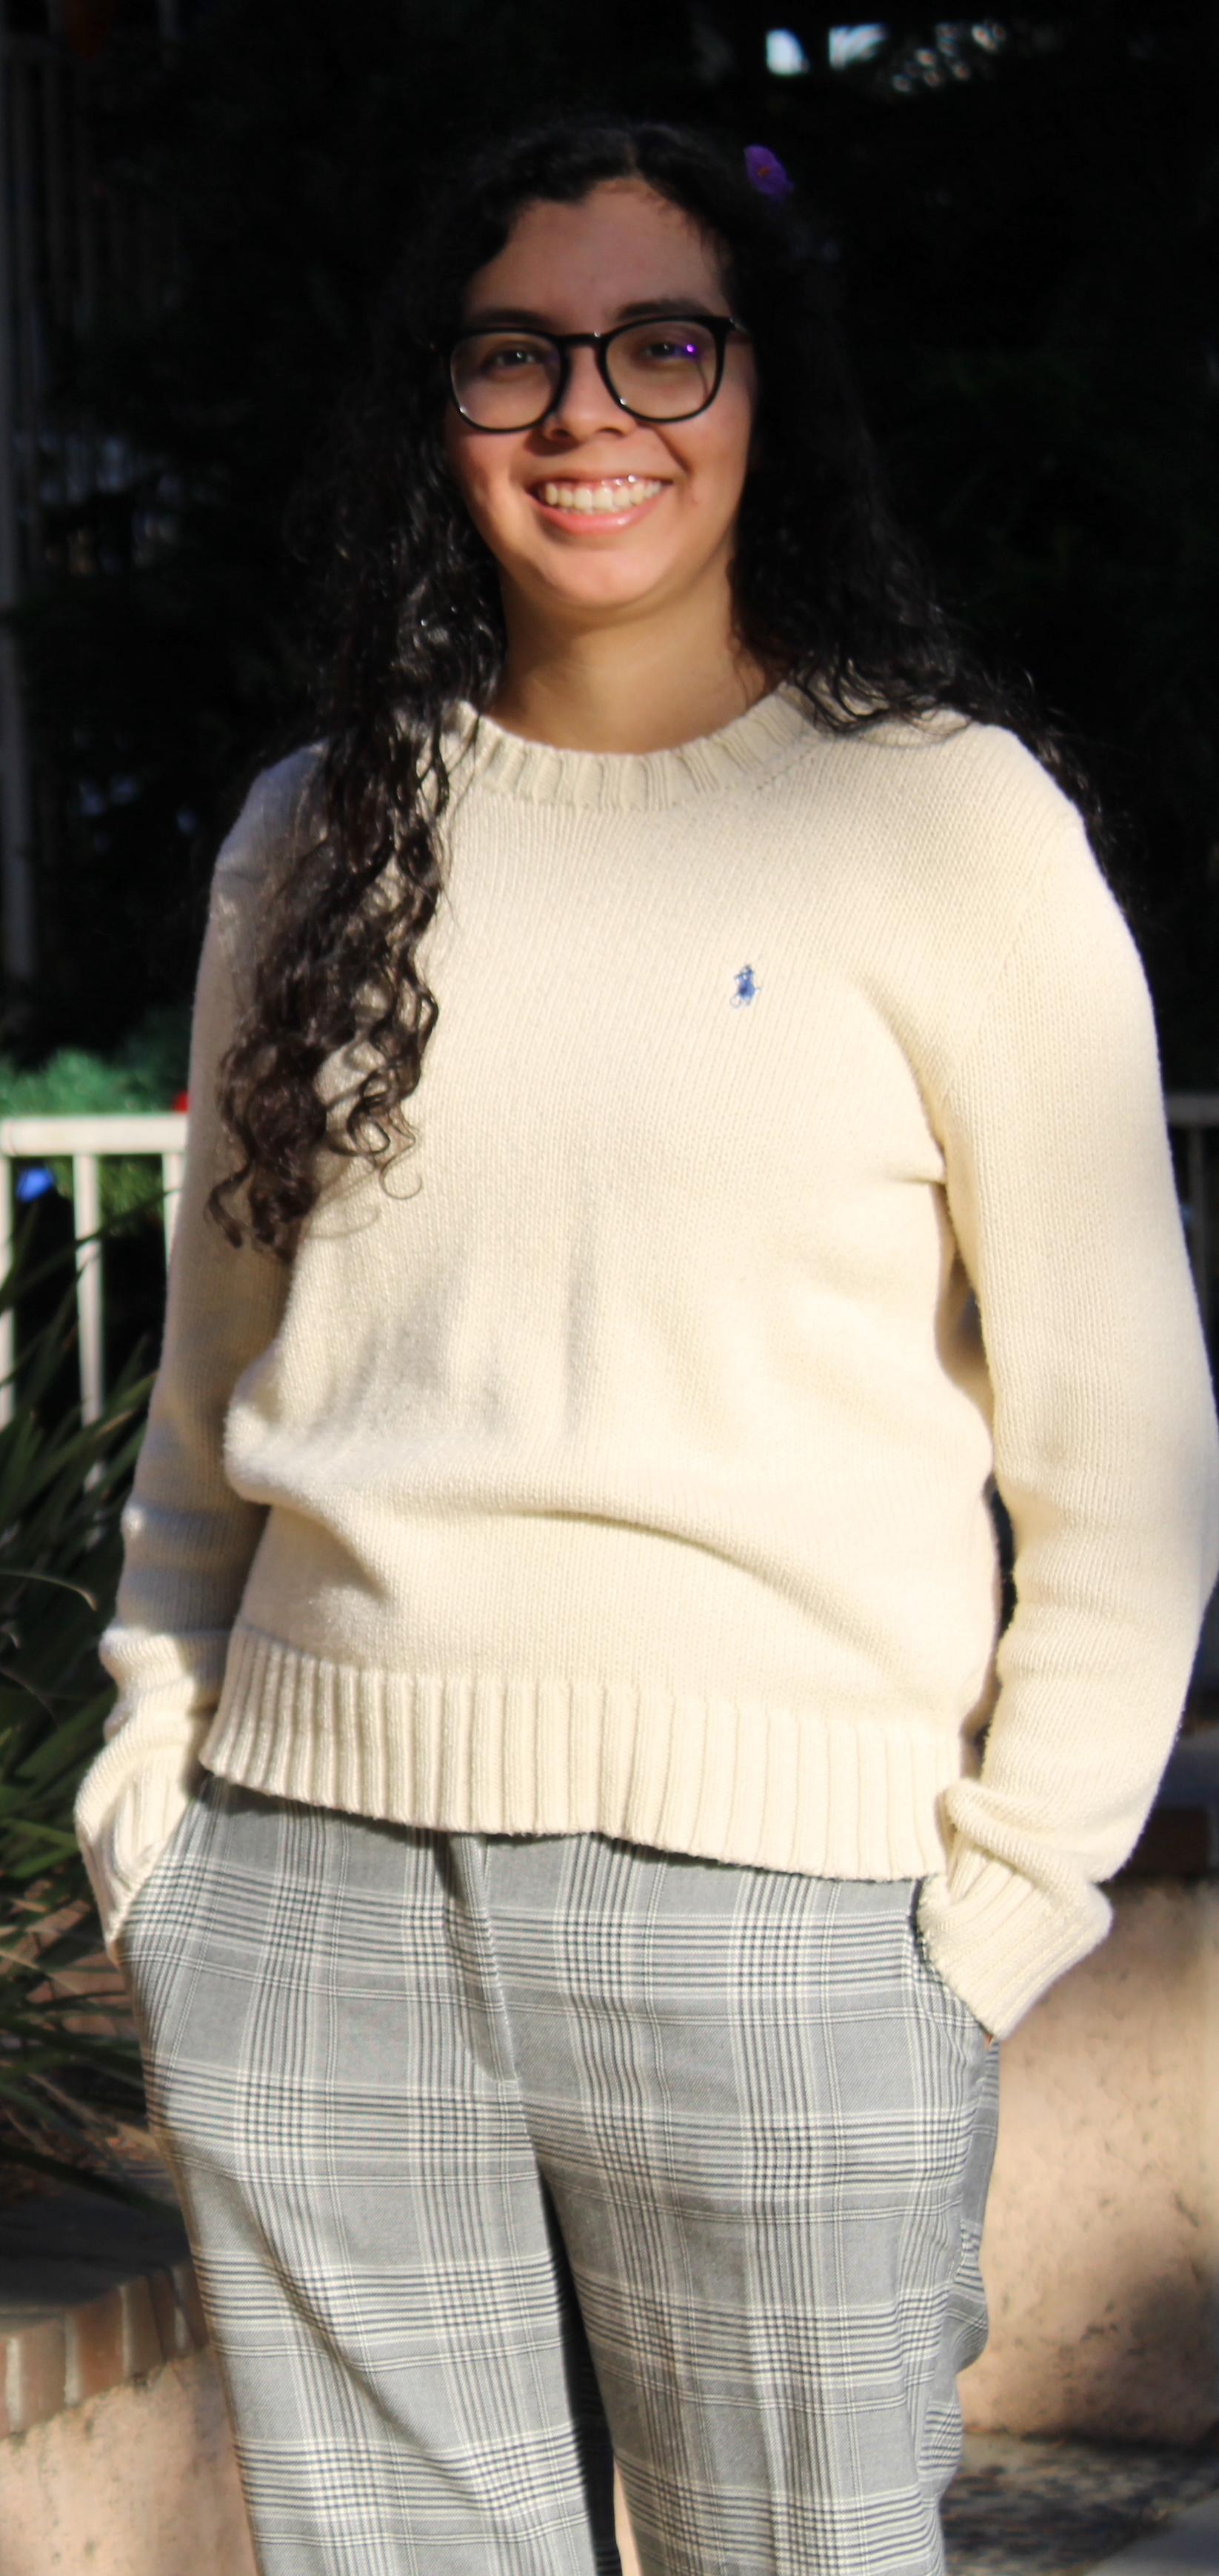 Ashley Huendo